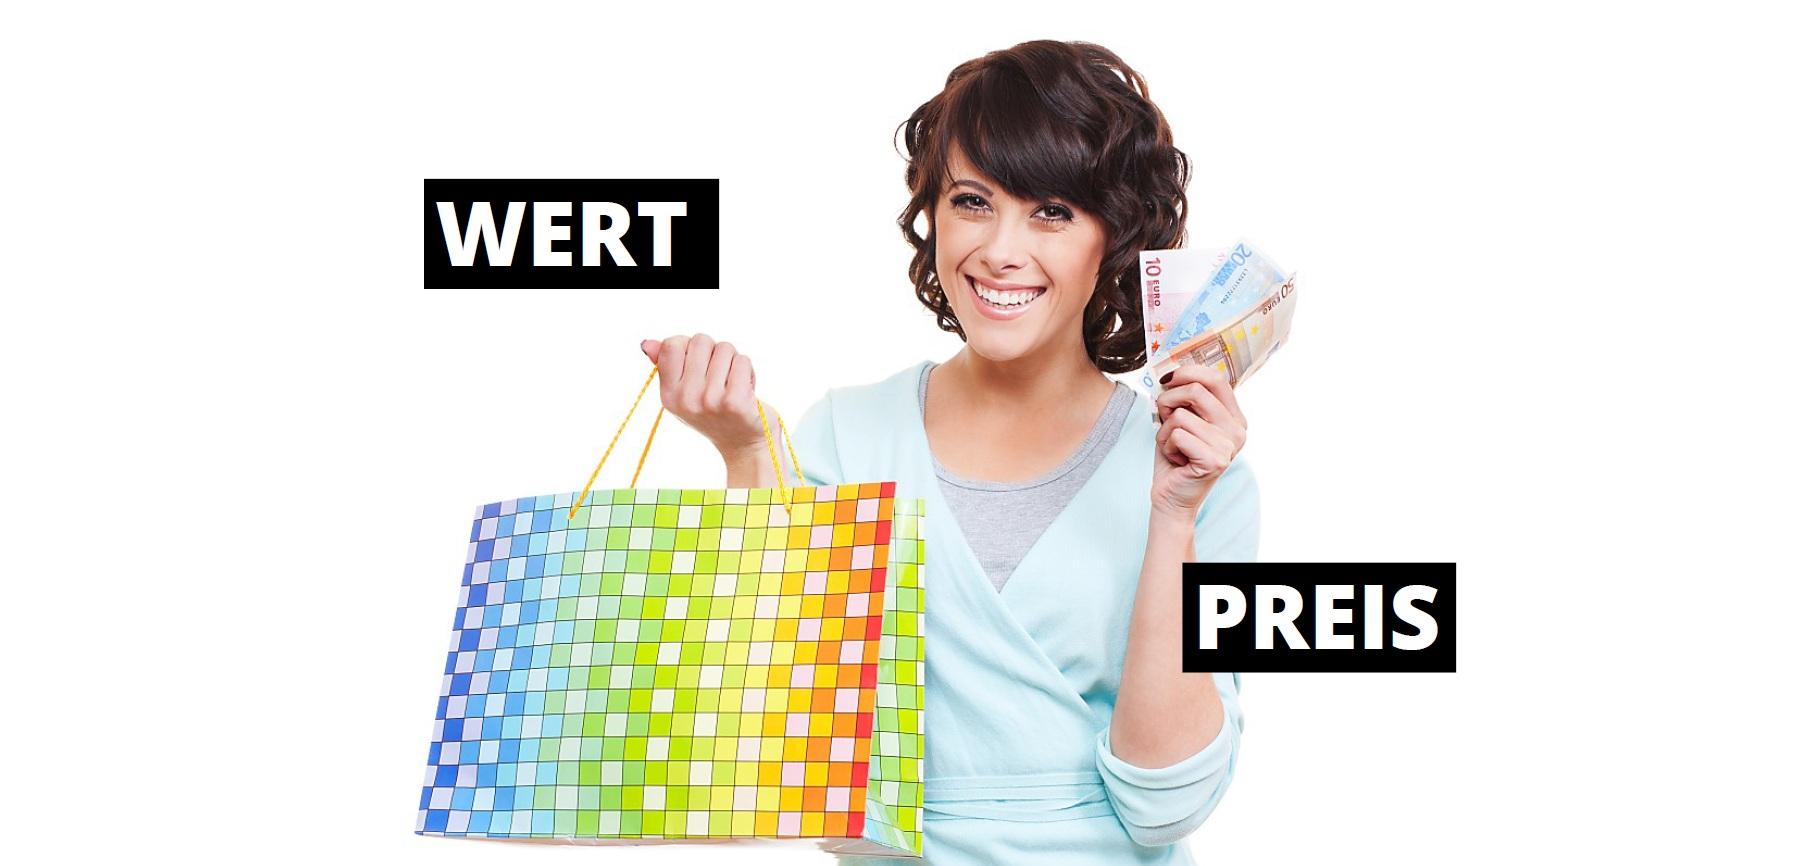 #unplugged Wert vs. Preis - Marketing 4.0 -Digitales Marketing